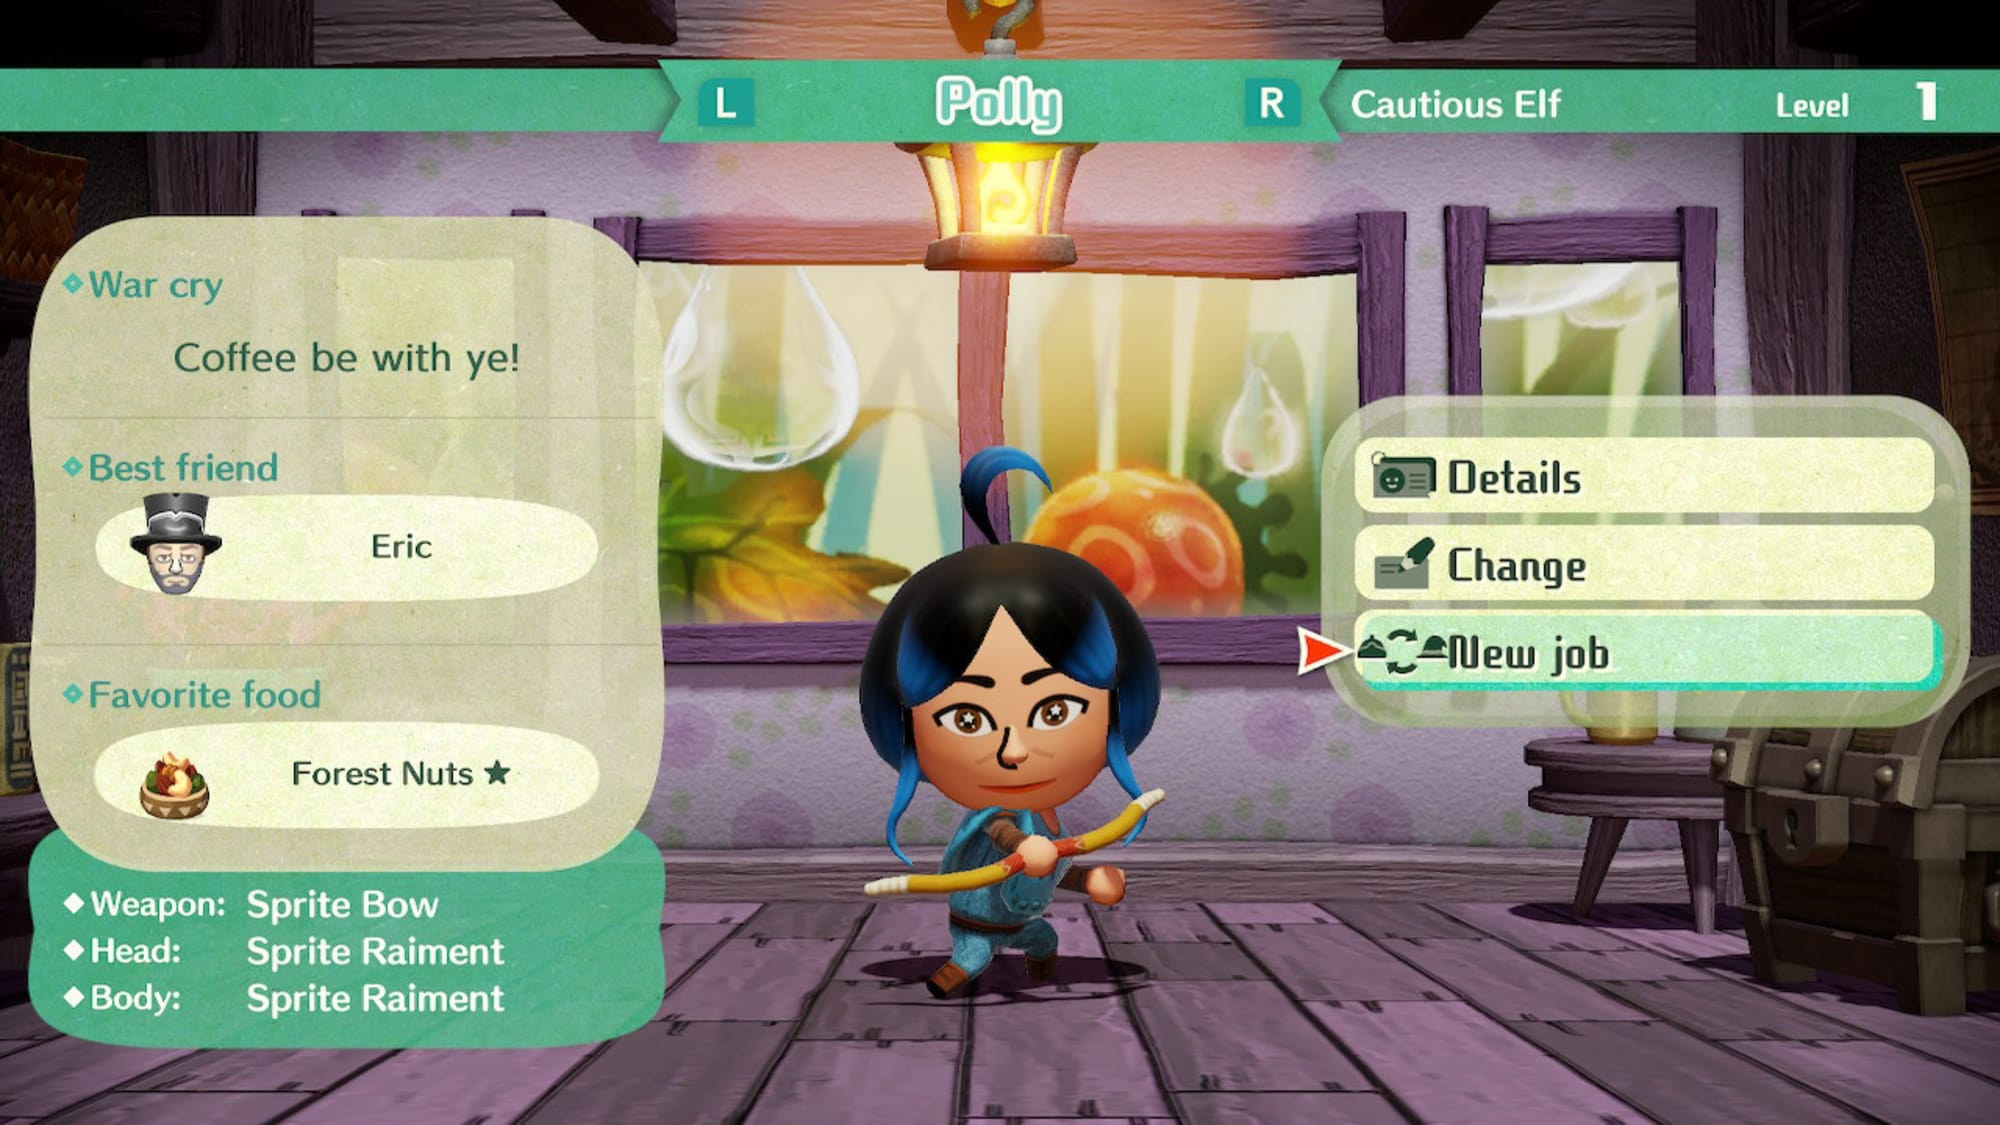 Miitopia: How to unlock the Elf Class